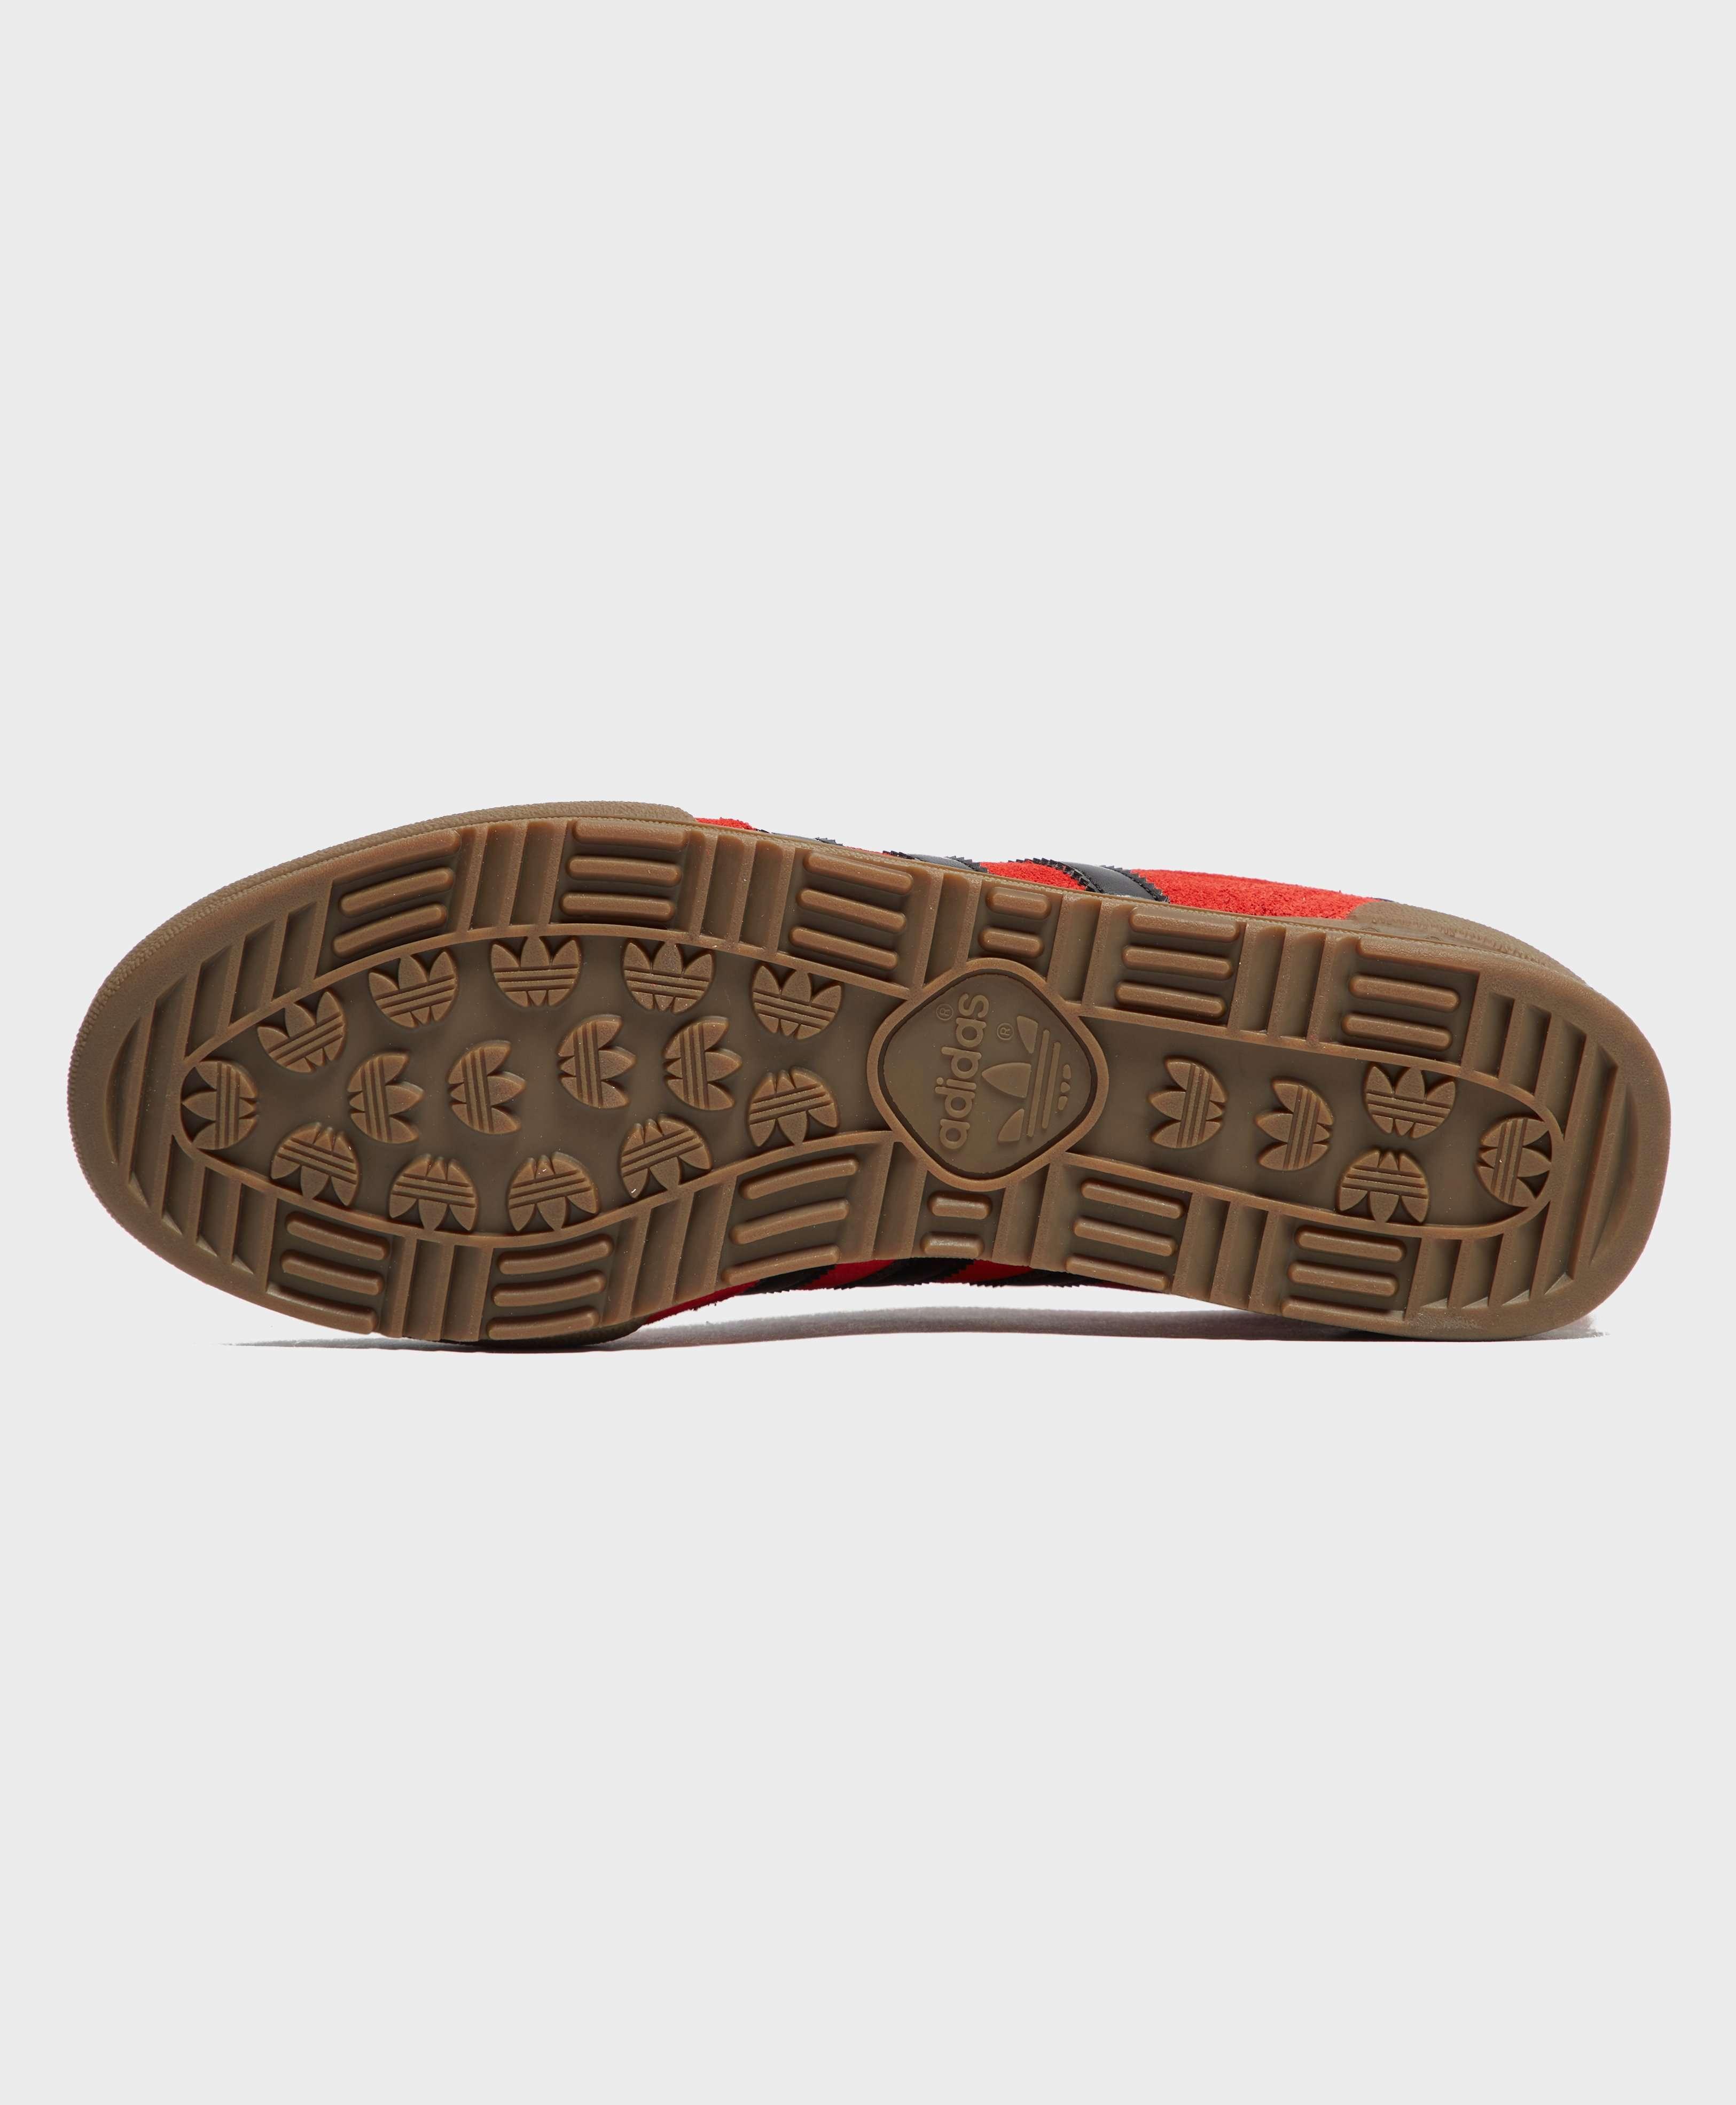 Adidas Originals Vaqueros Scotts hombre 882abb  882abb hombre escaparatinova 3e2067